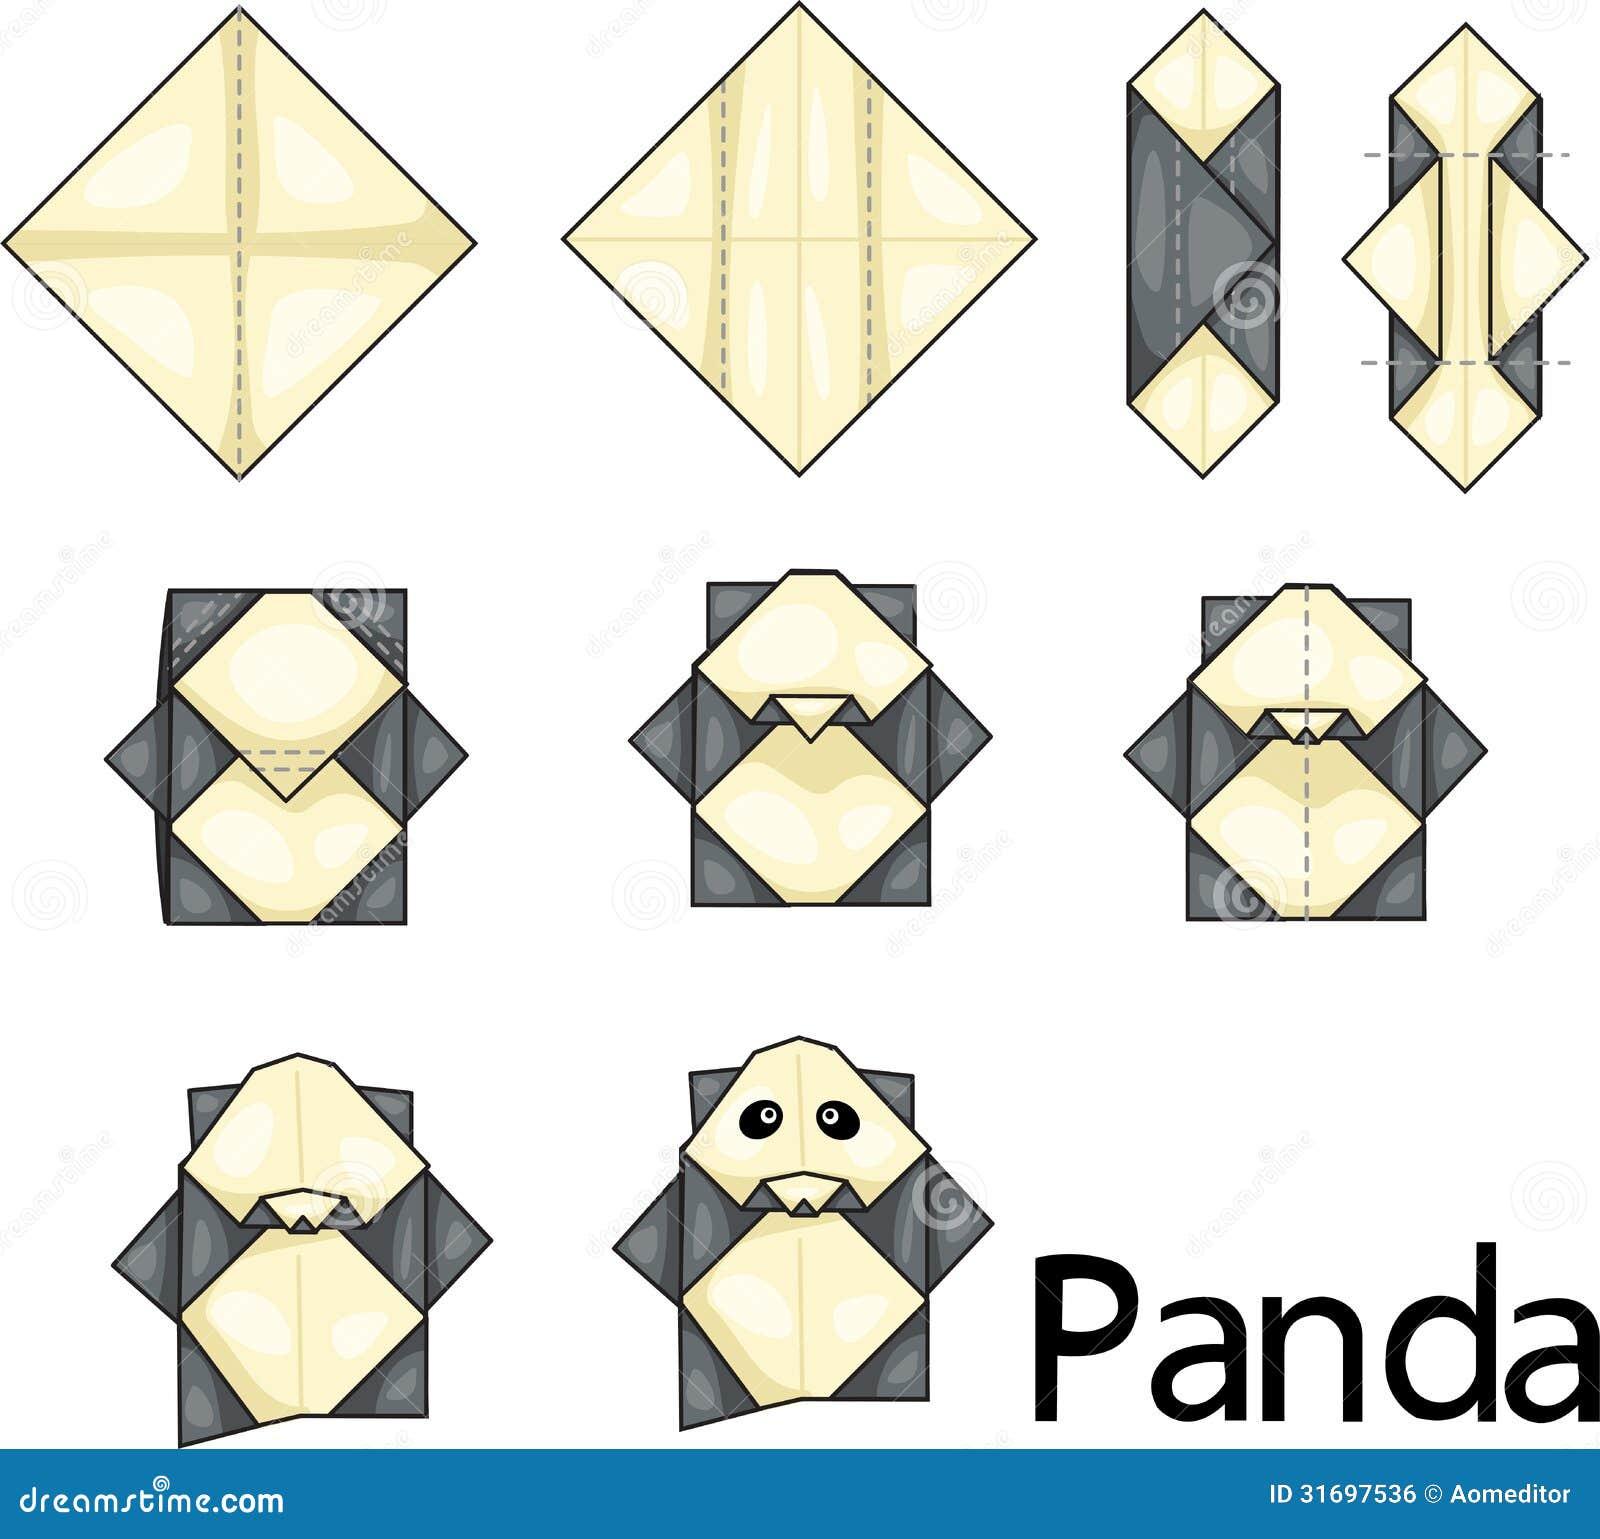 Origami Panda Royalty Free Stock Image Image 31697536